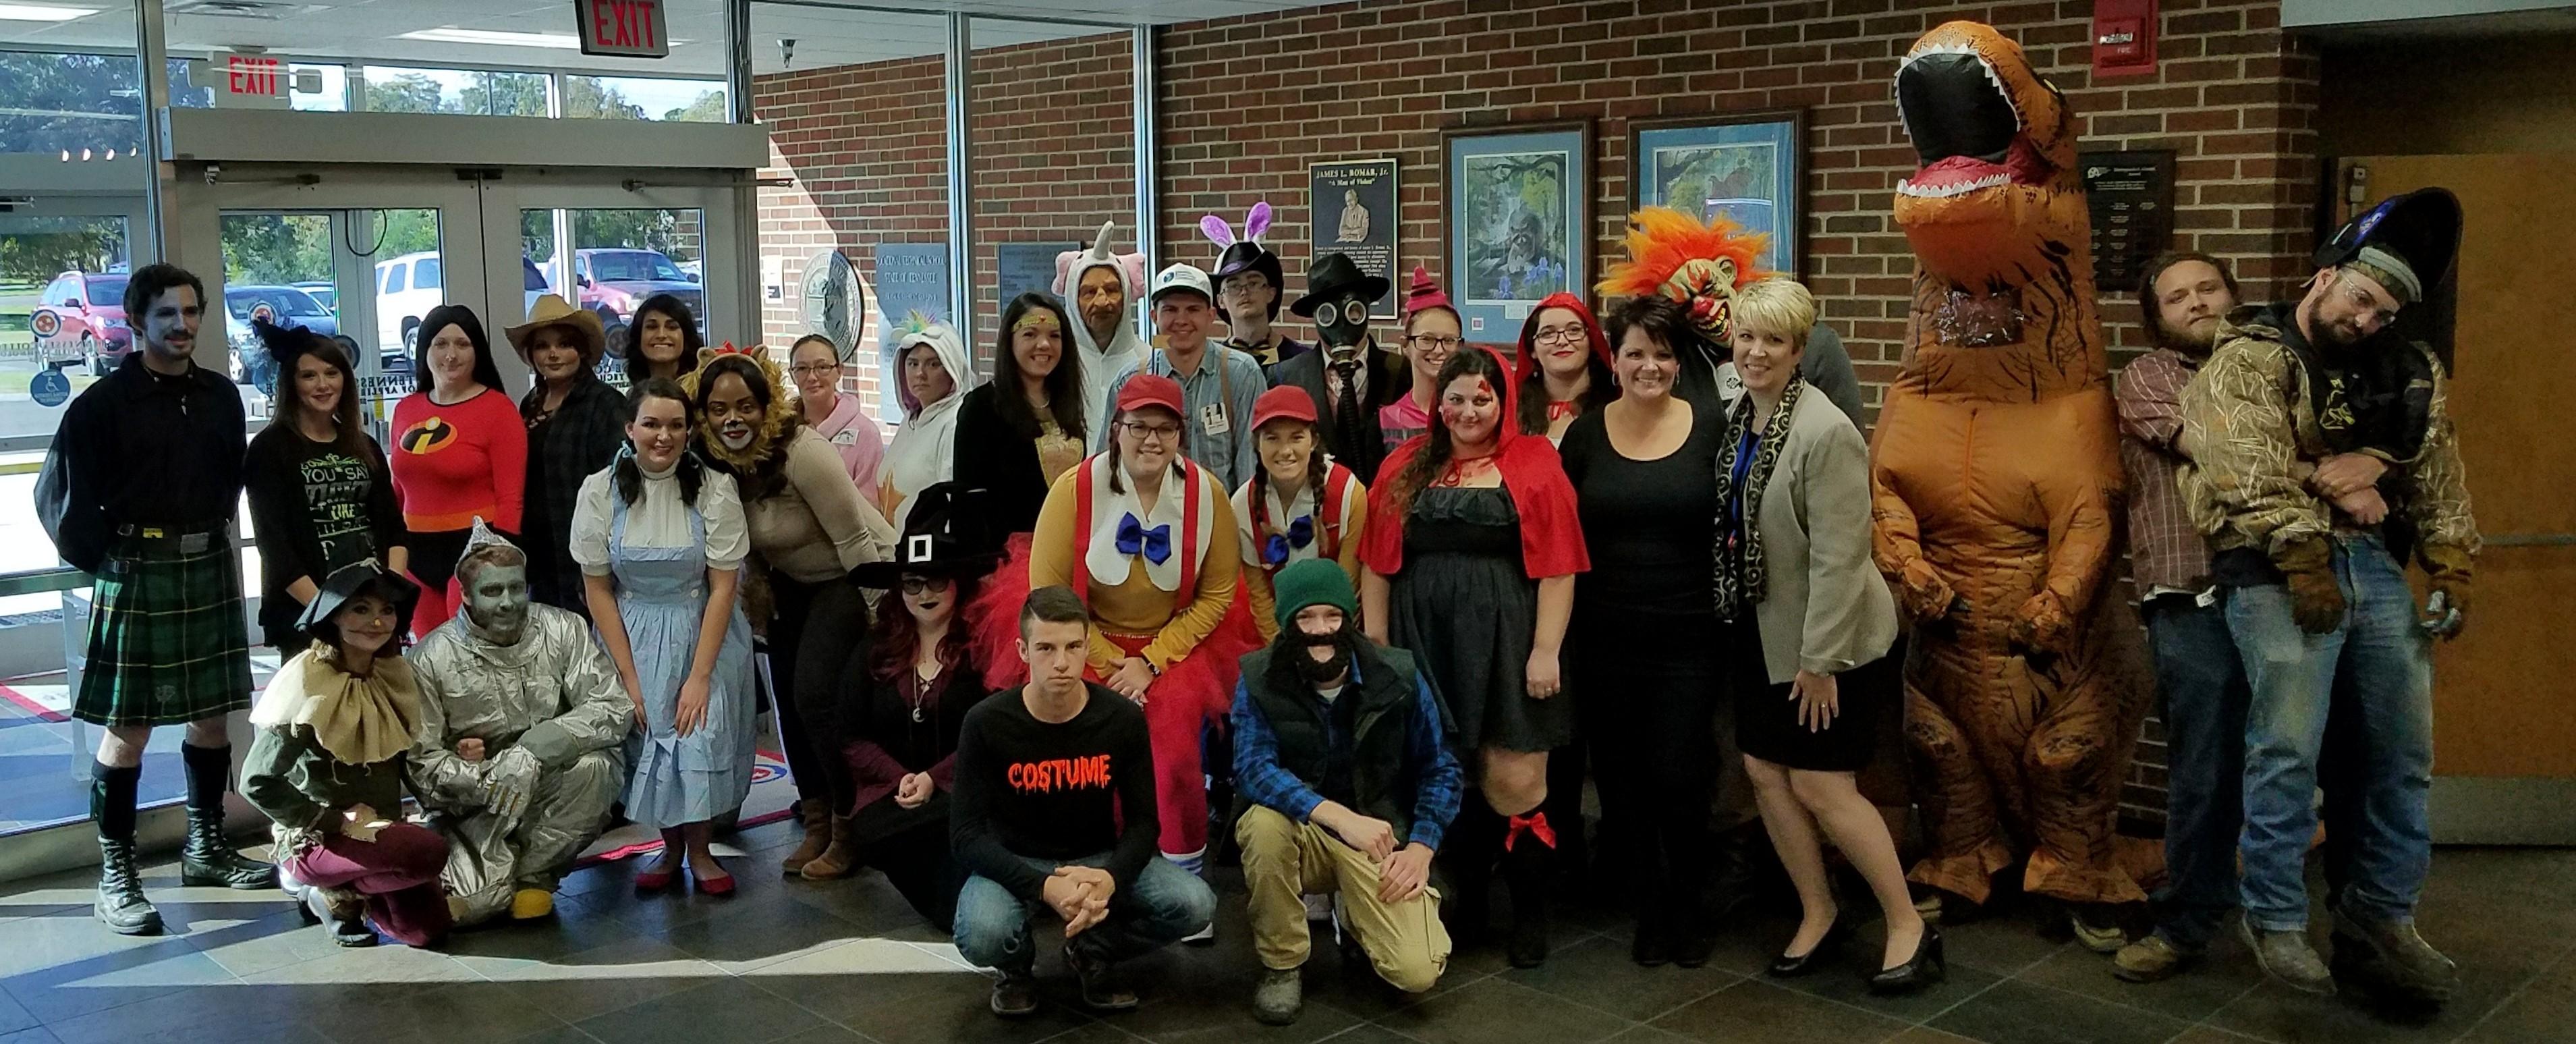 Halloween Costume Contest participants